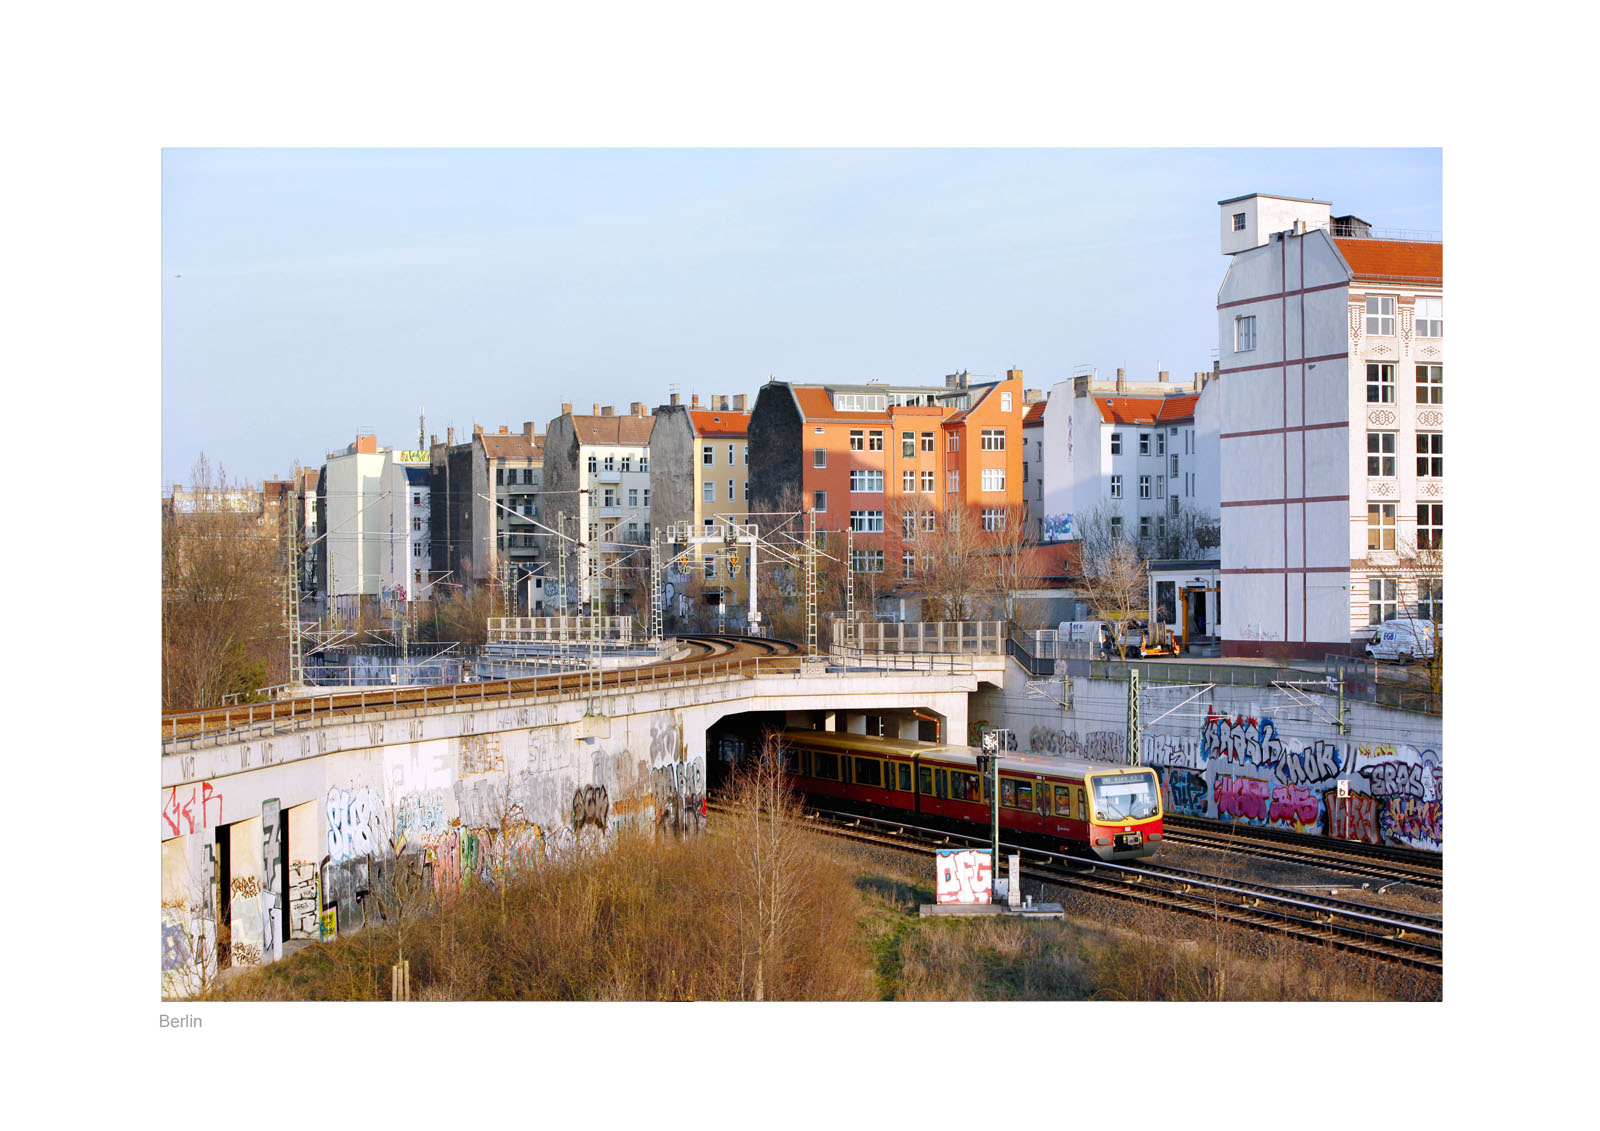 005-Norsic-urbanisme-003